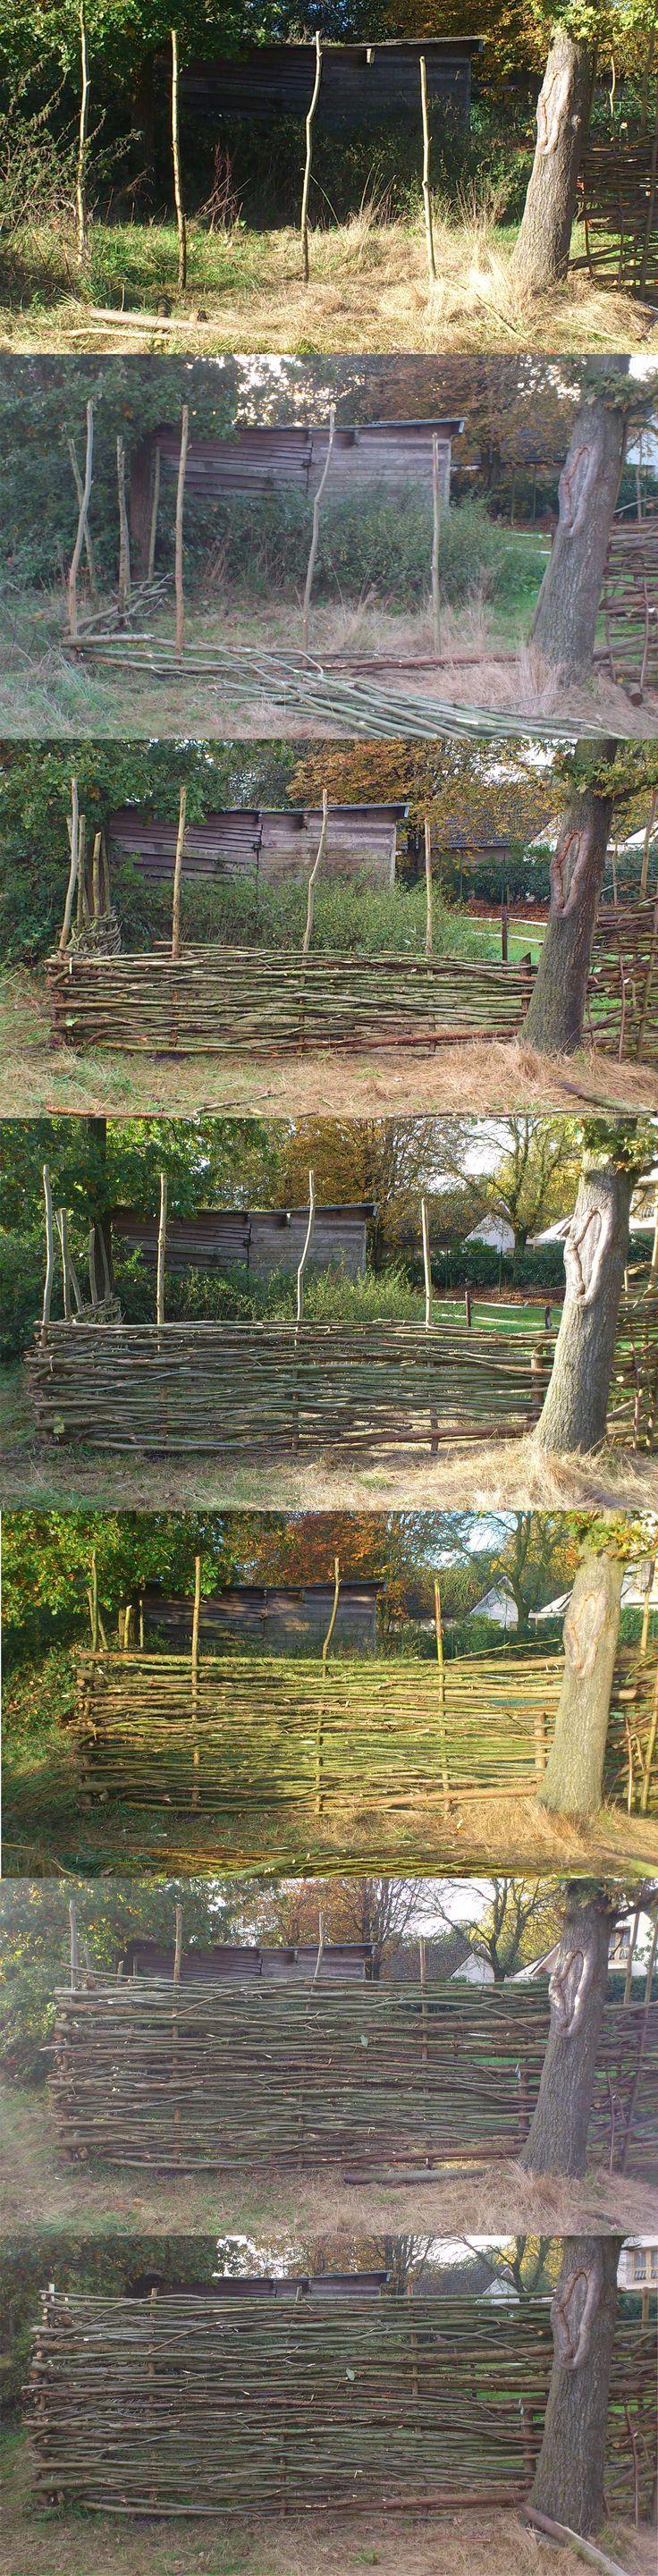 Homemade Wattle Fence Diy Diy Fence Homemade Sack Wattle Wattle Fence Willow Fence Natural Fence